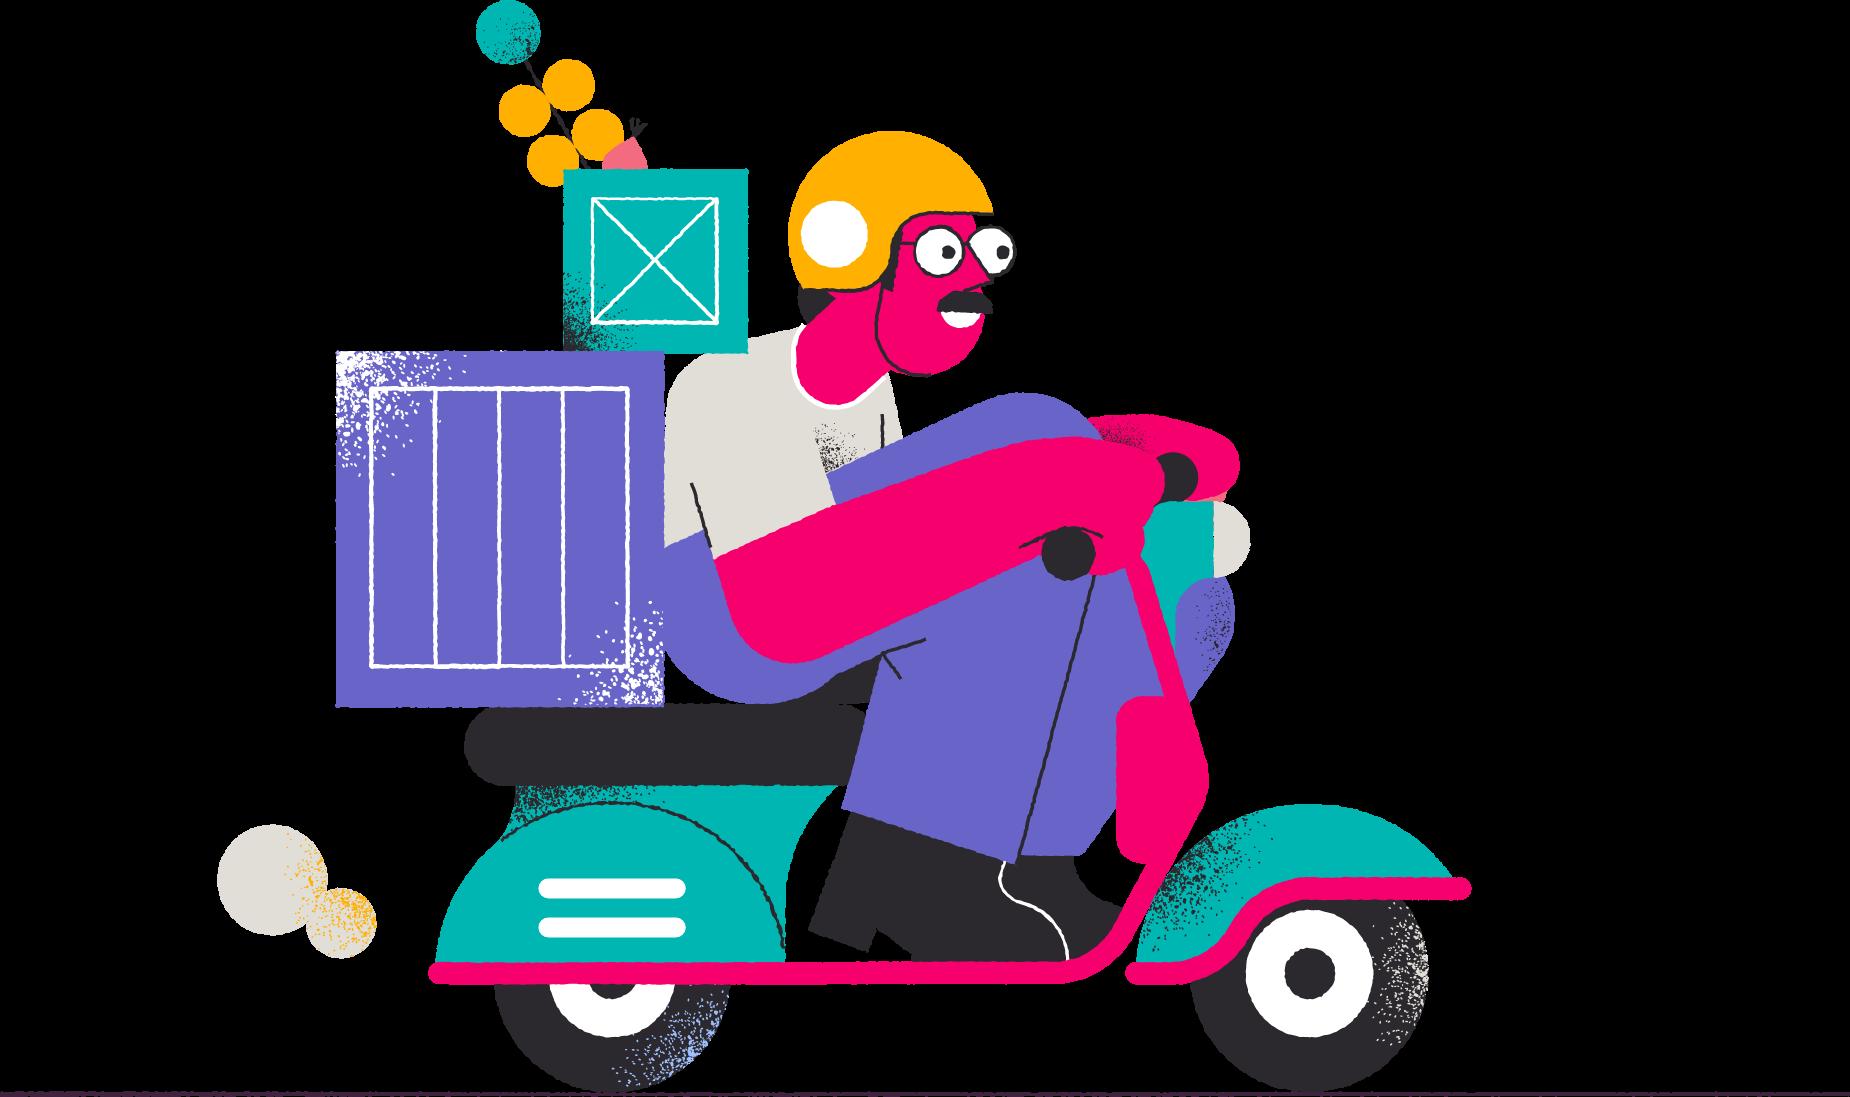 Illustration of man moving items on a motor bike